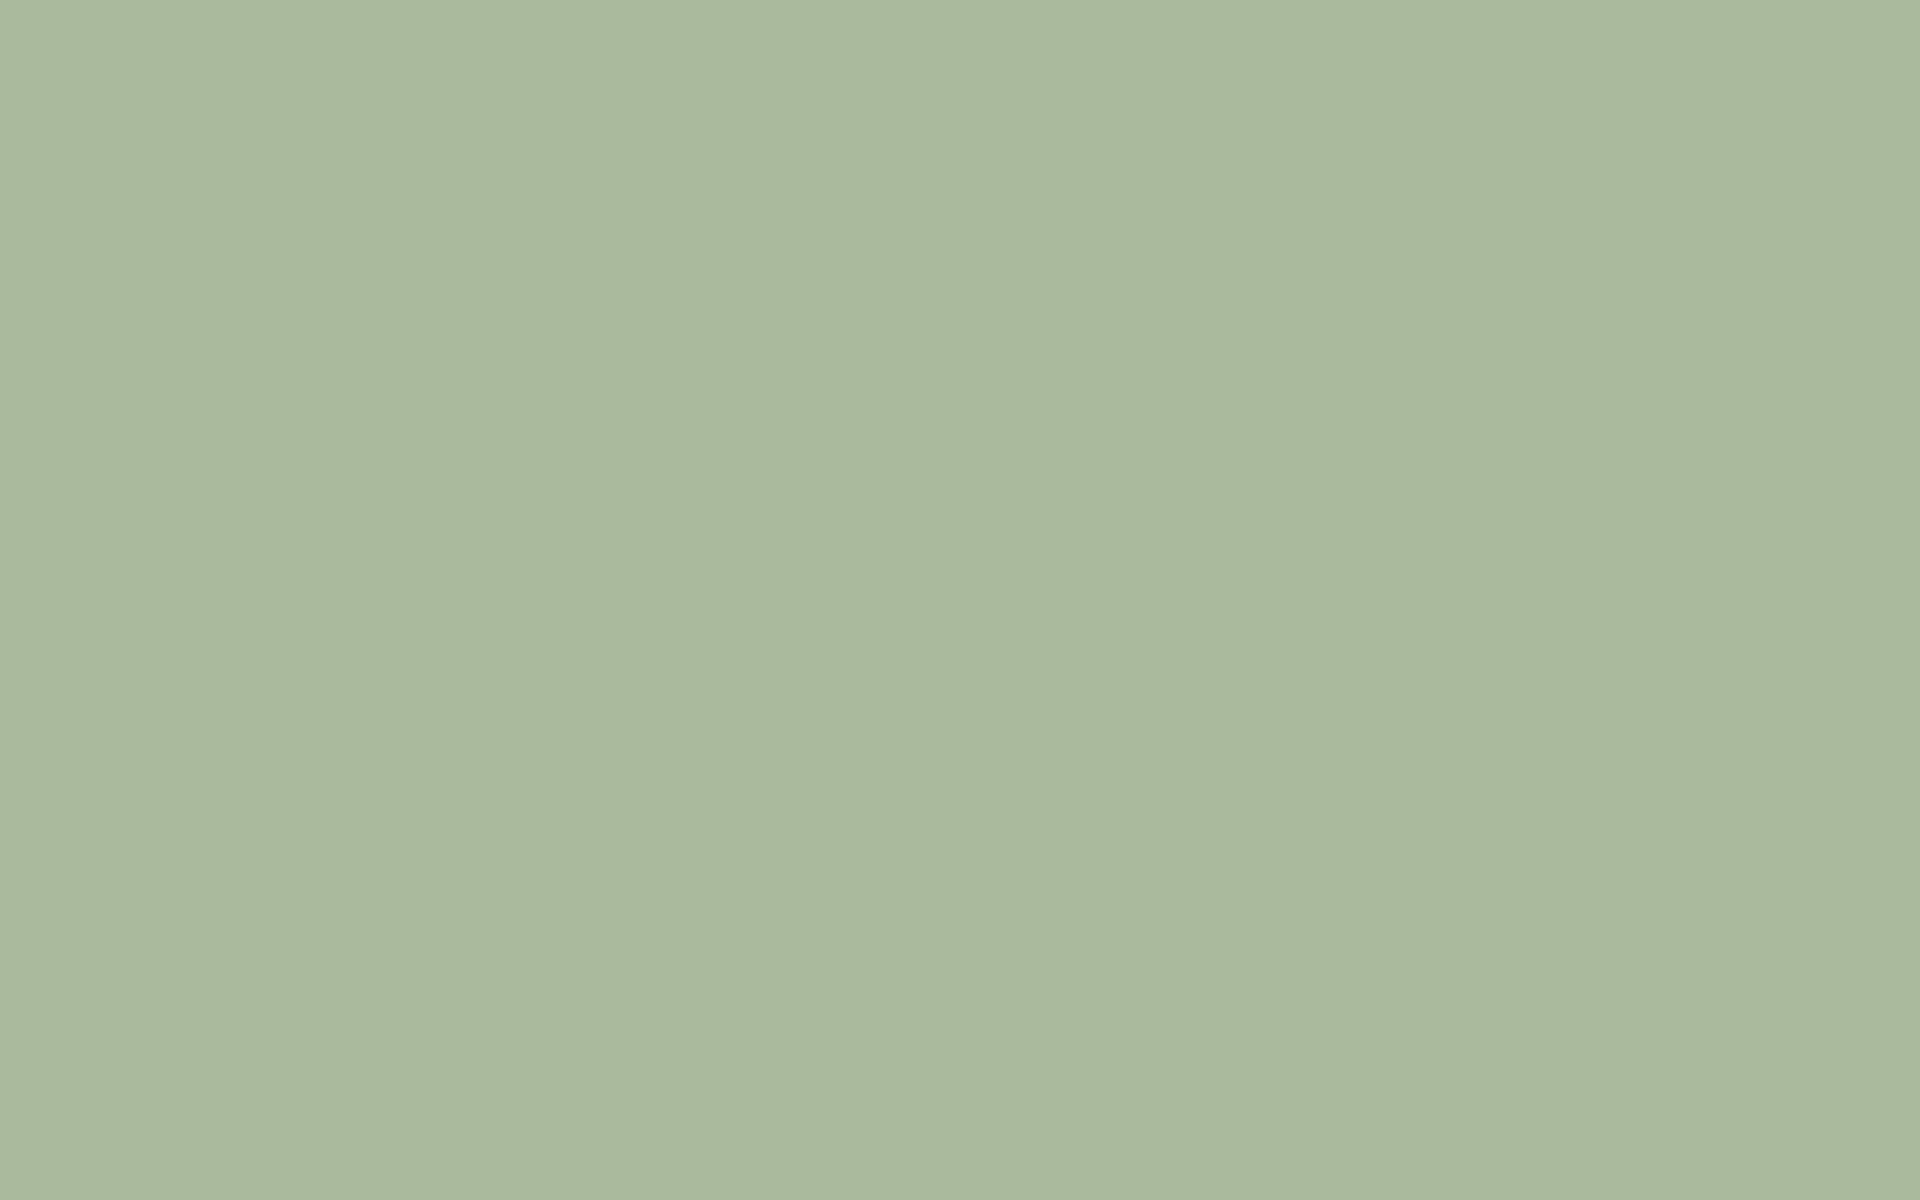 1920x1200 Laurel Green Solid Color Background